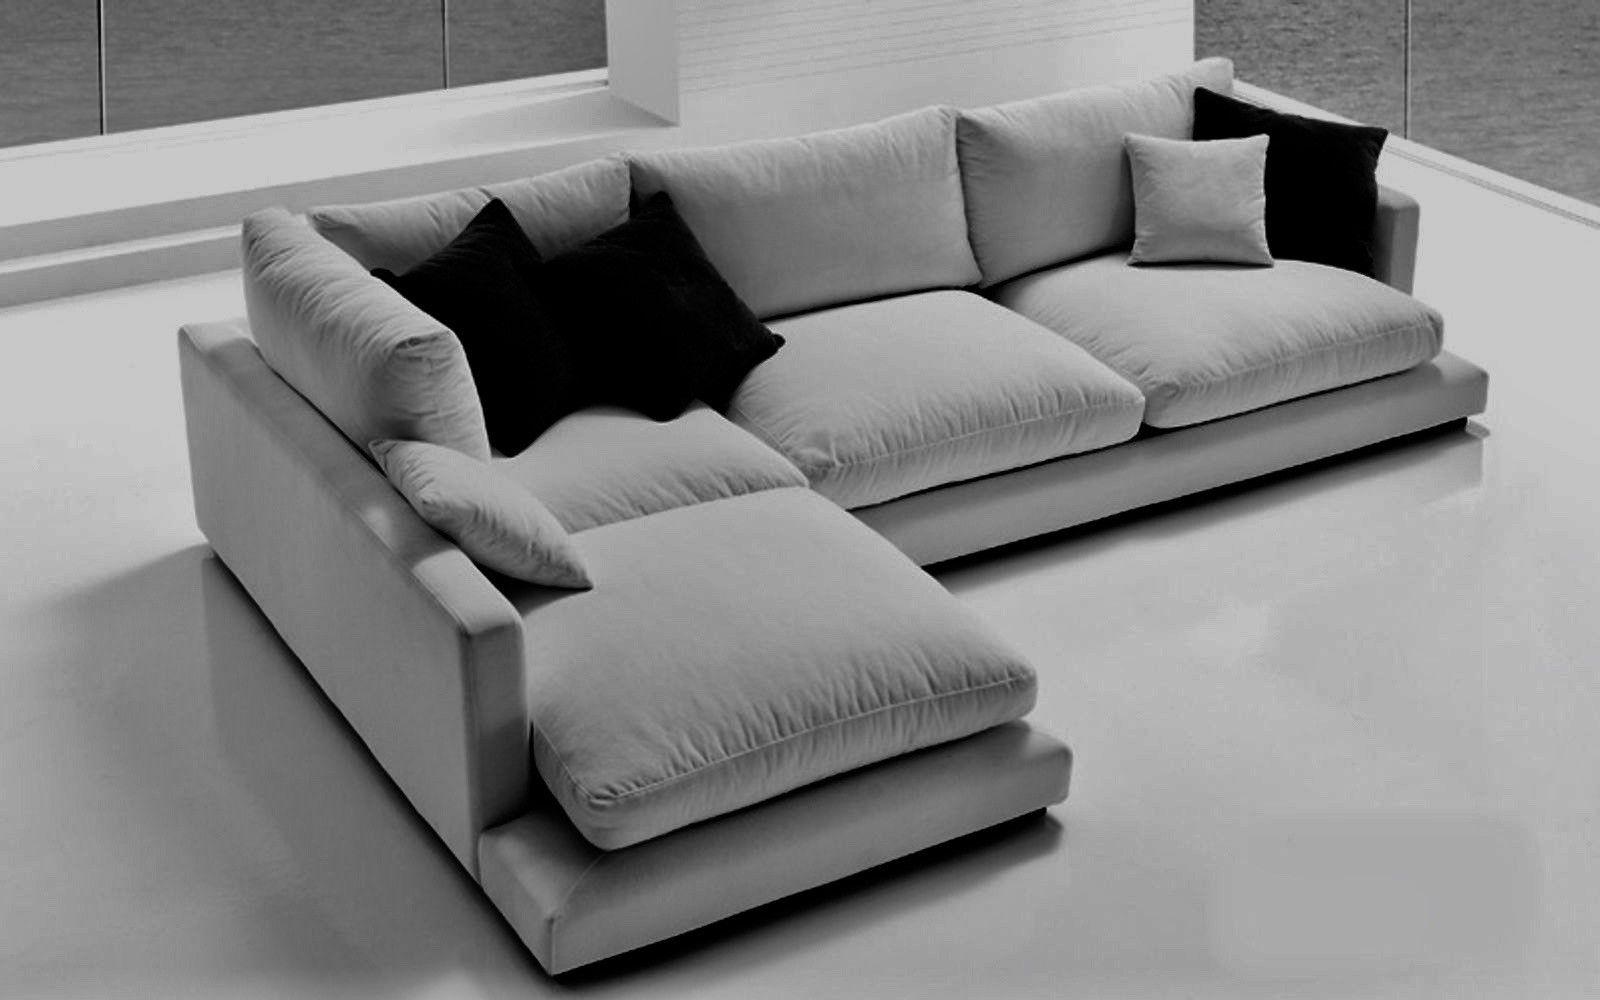 Sofas Grandes Sofas Modulares Sofa De La Sala Sofa Grande